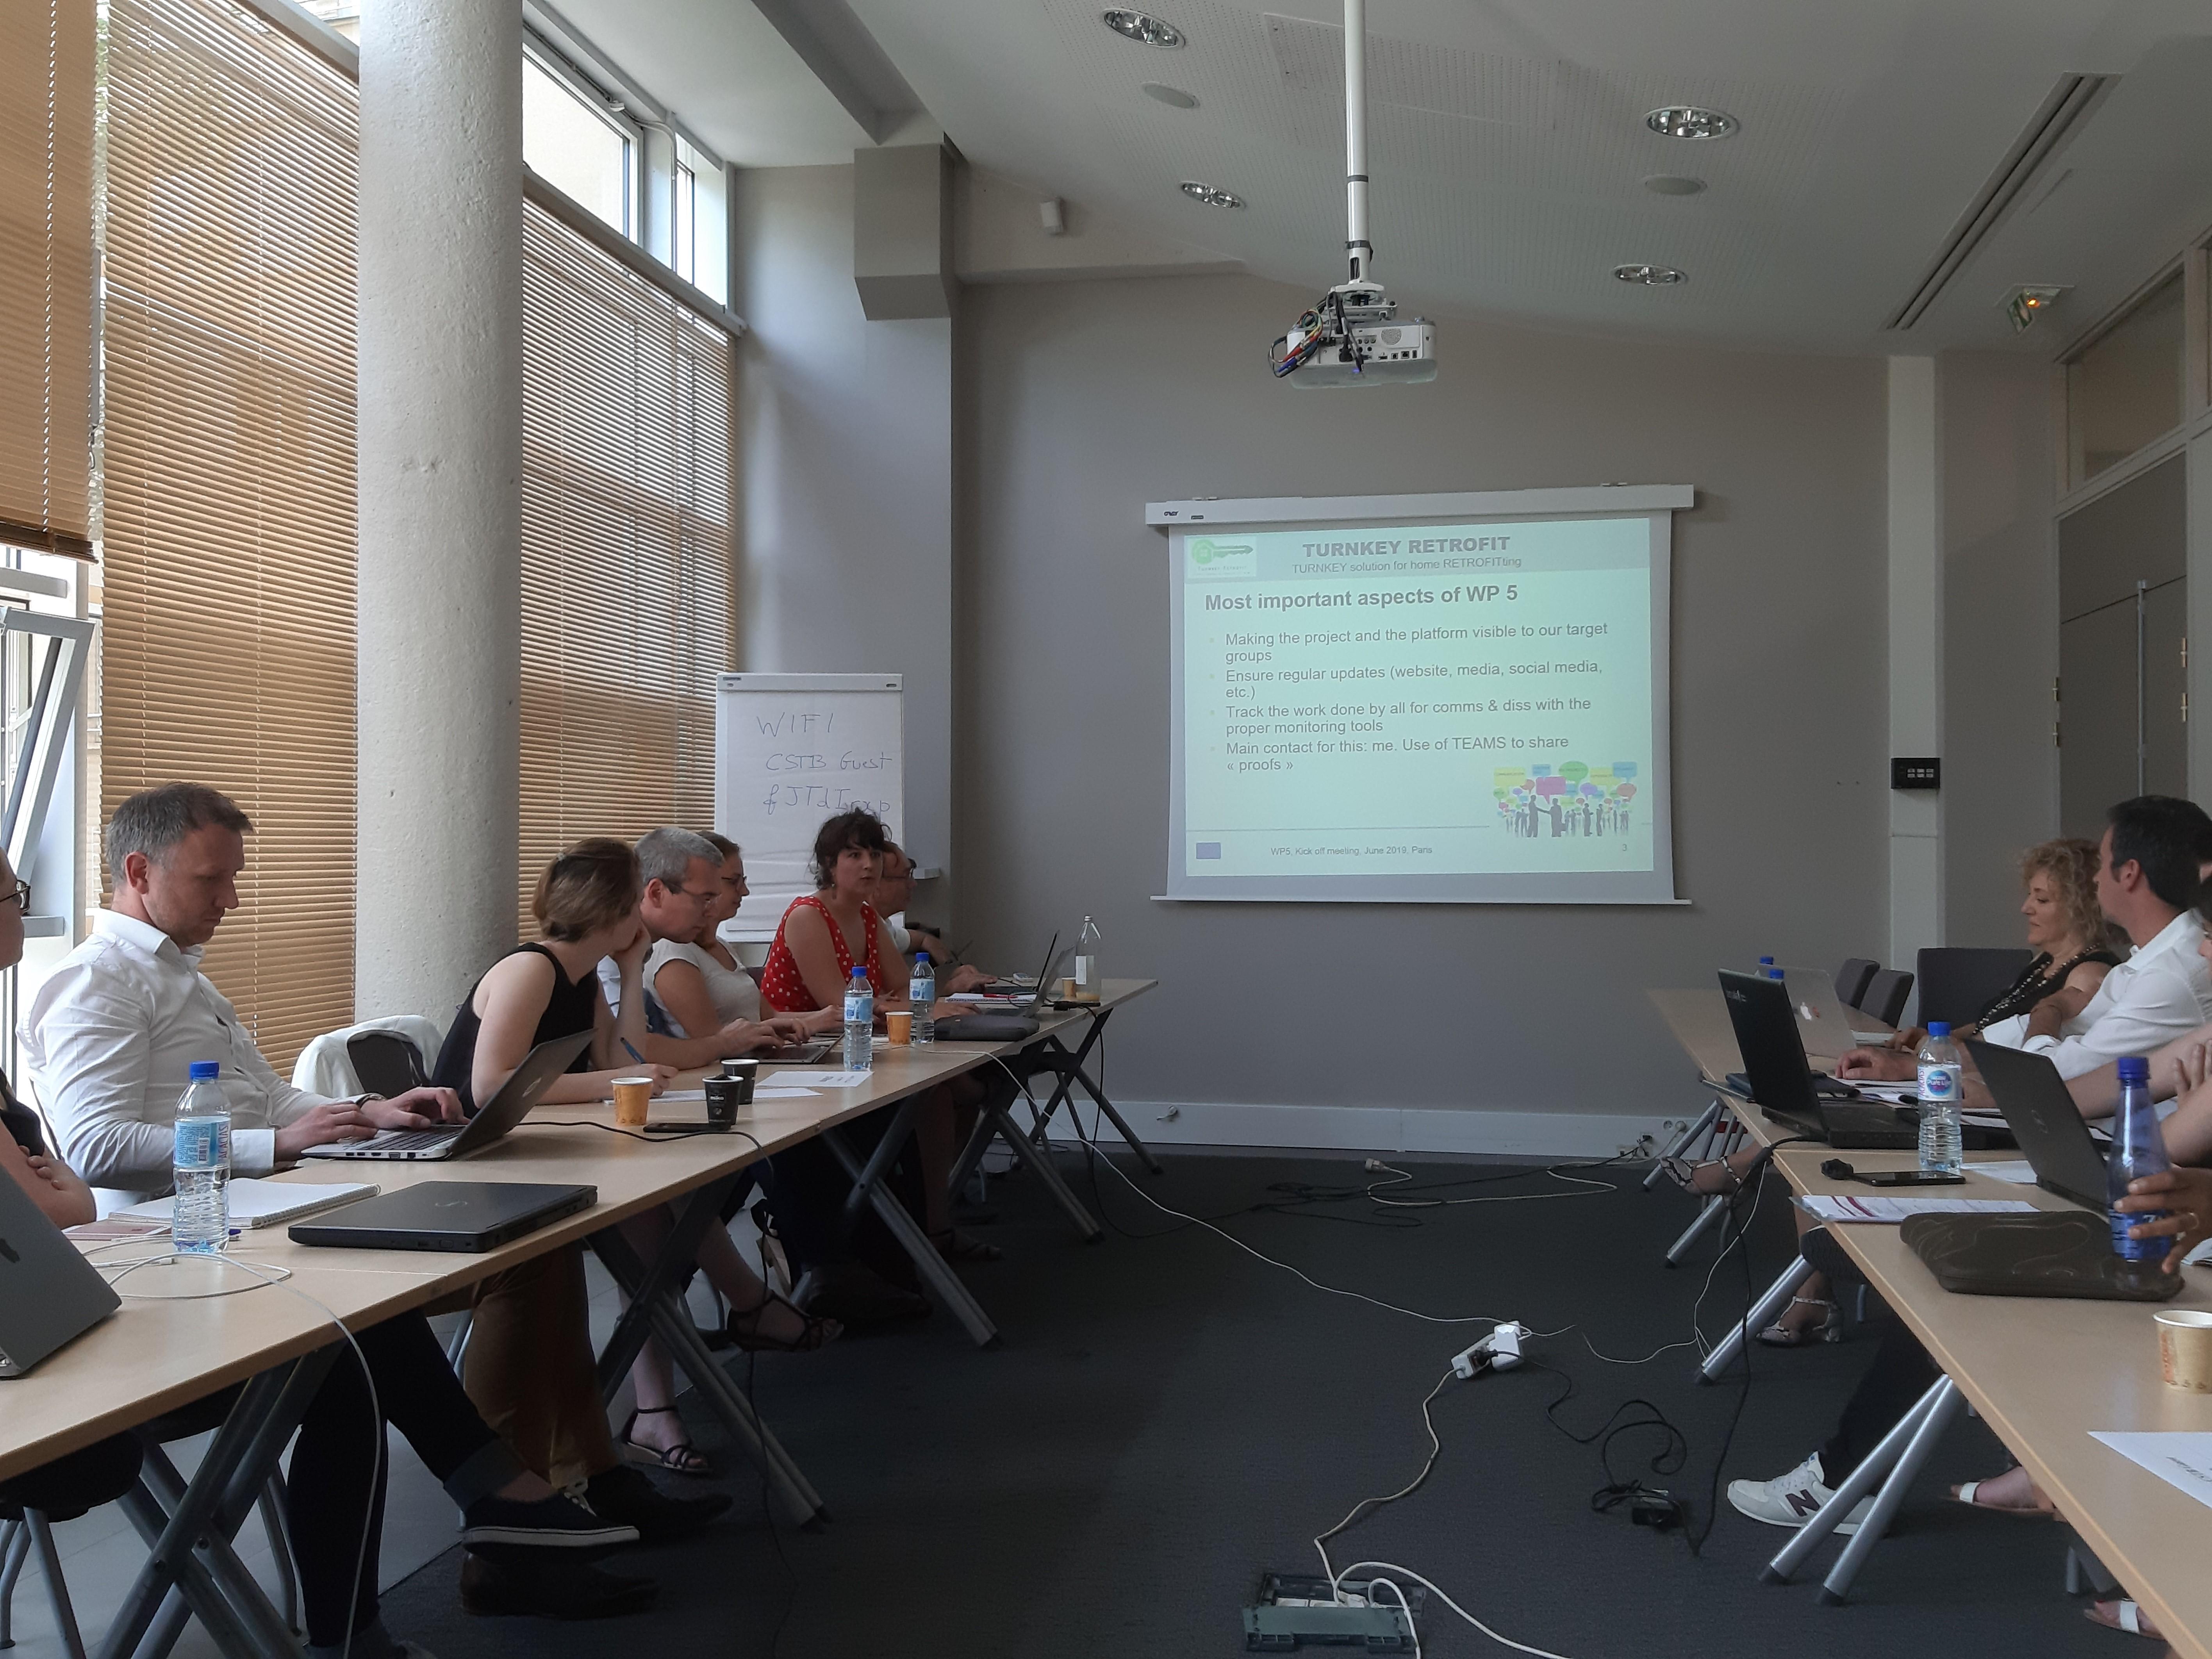 Turnkey Retrofit meeting Paris June 2019